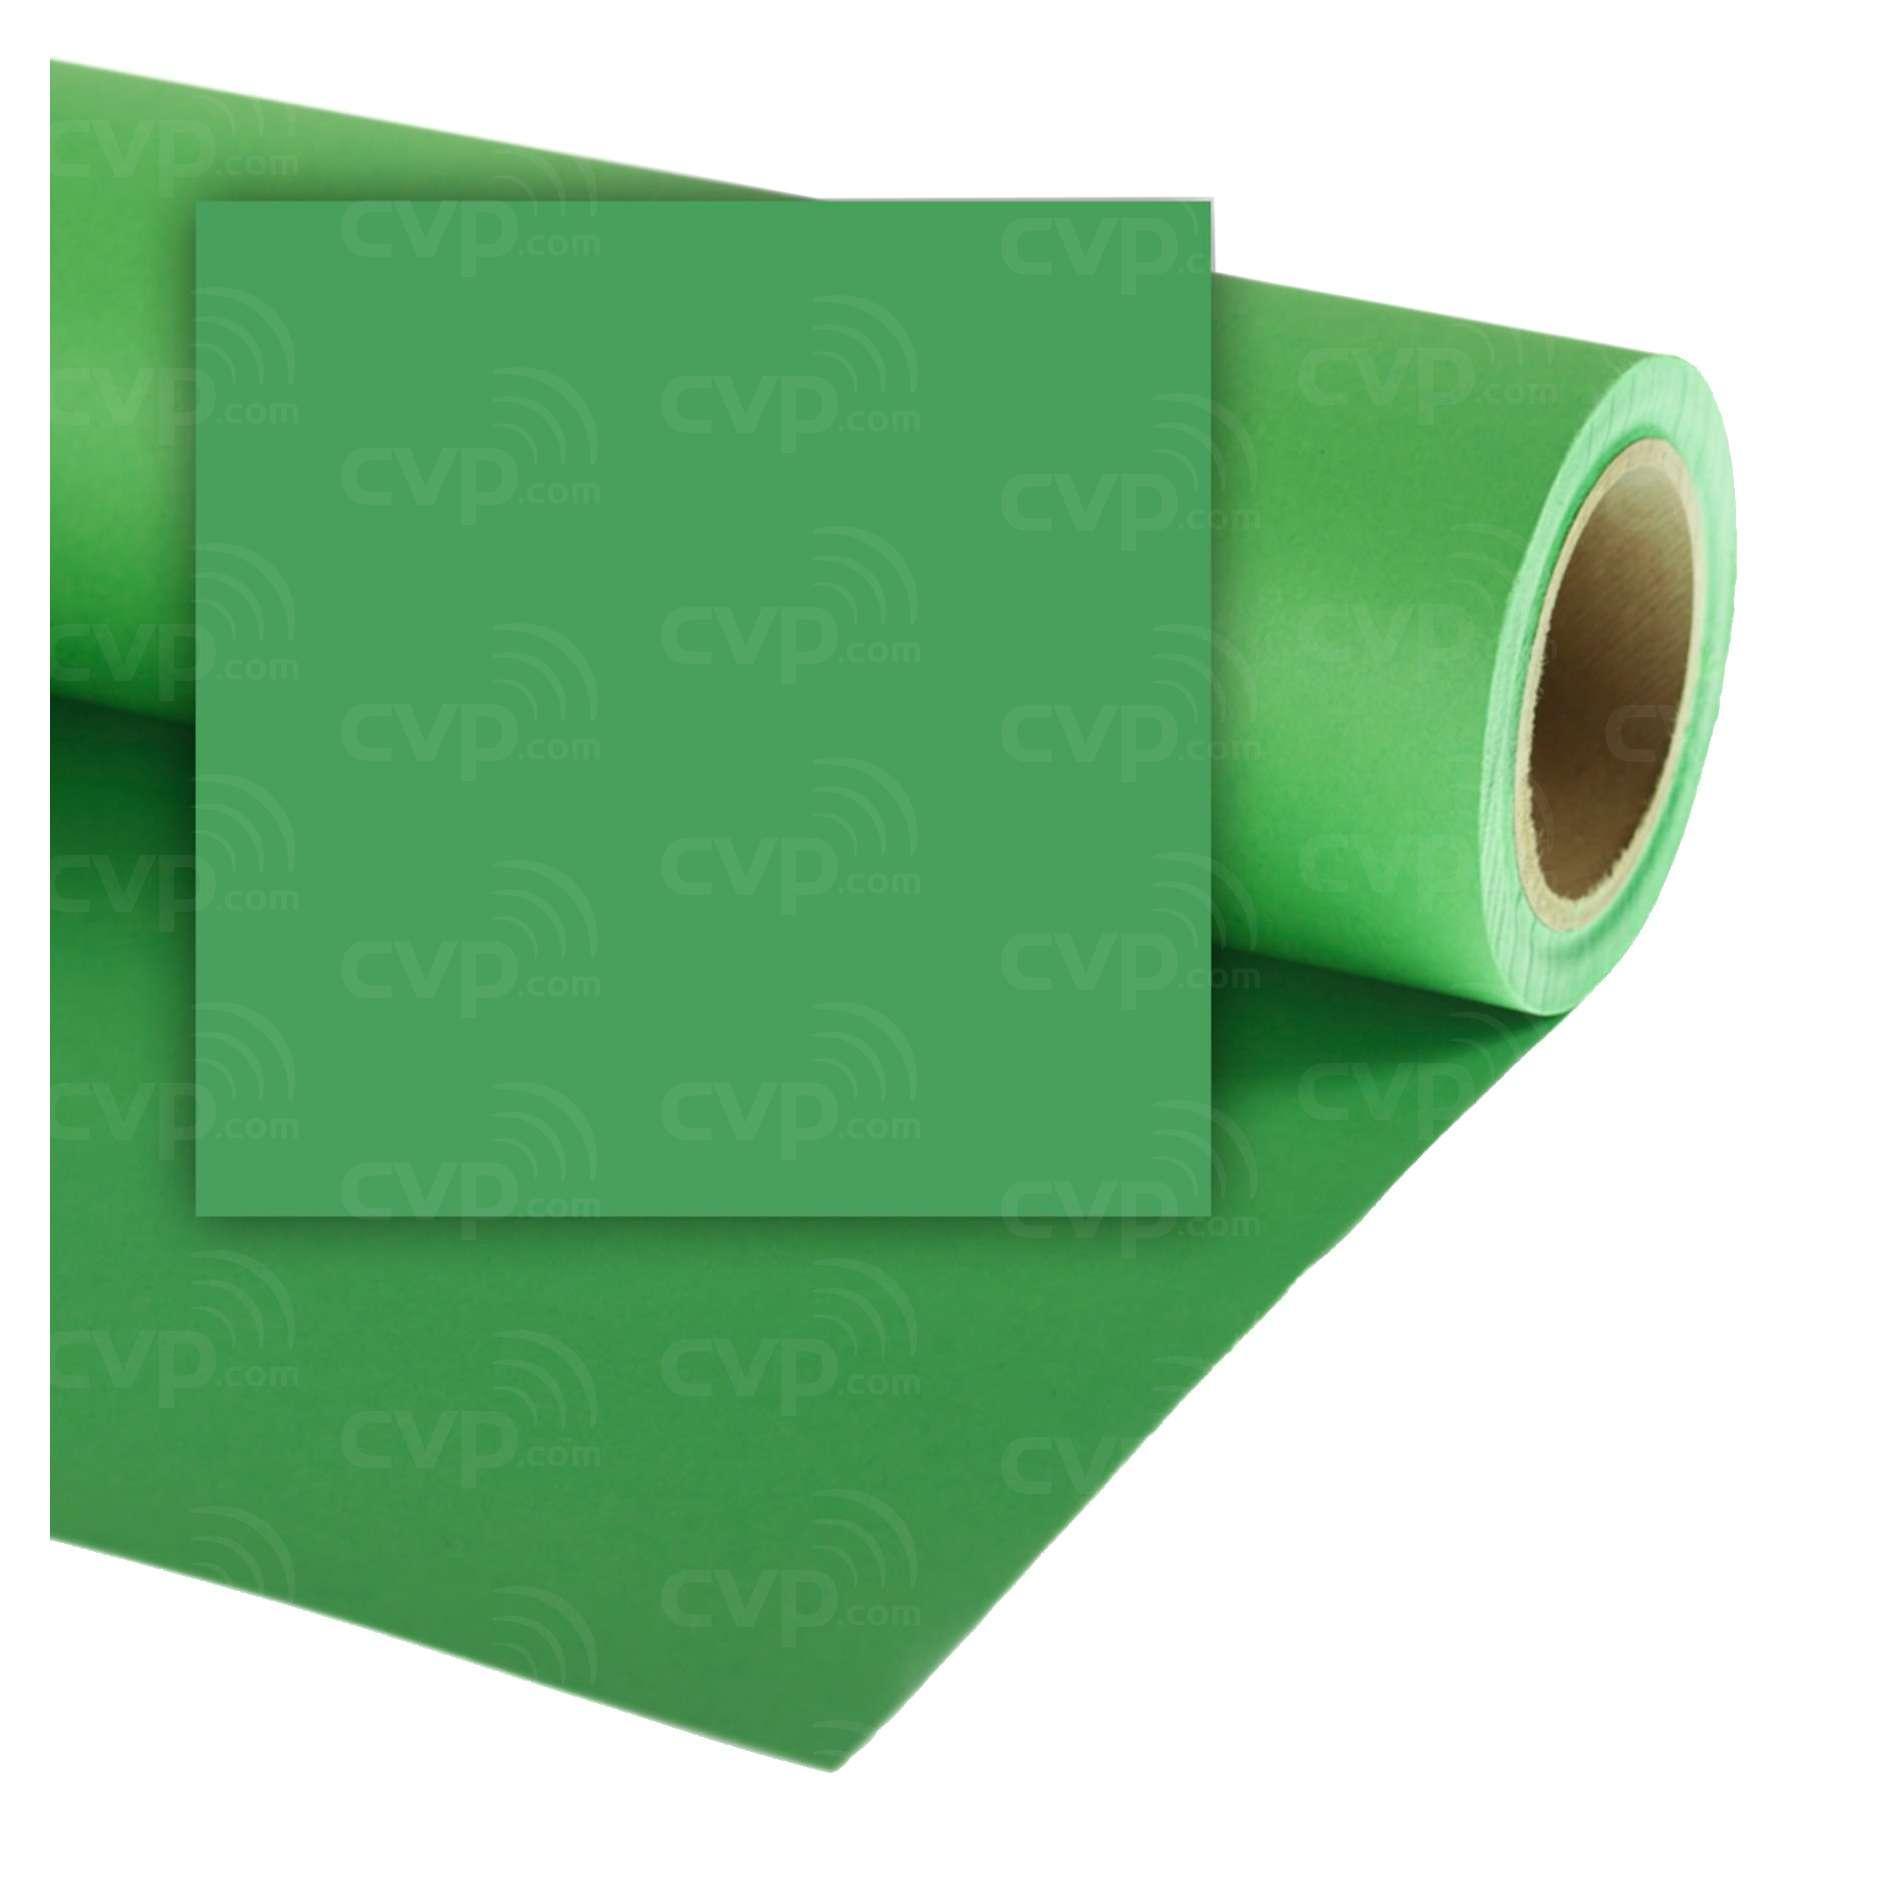 Colorama LL CO533 Chroma Green BG